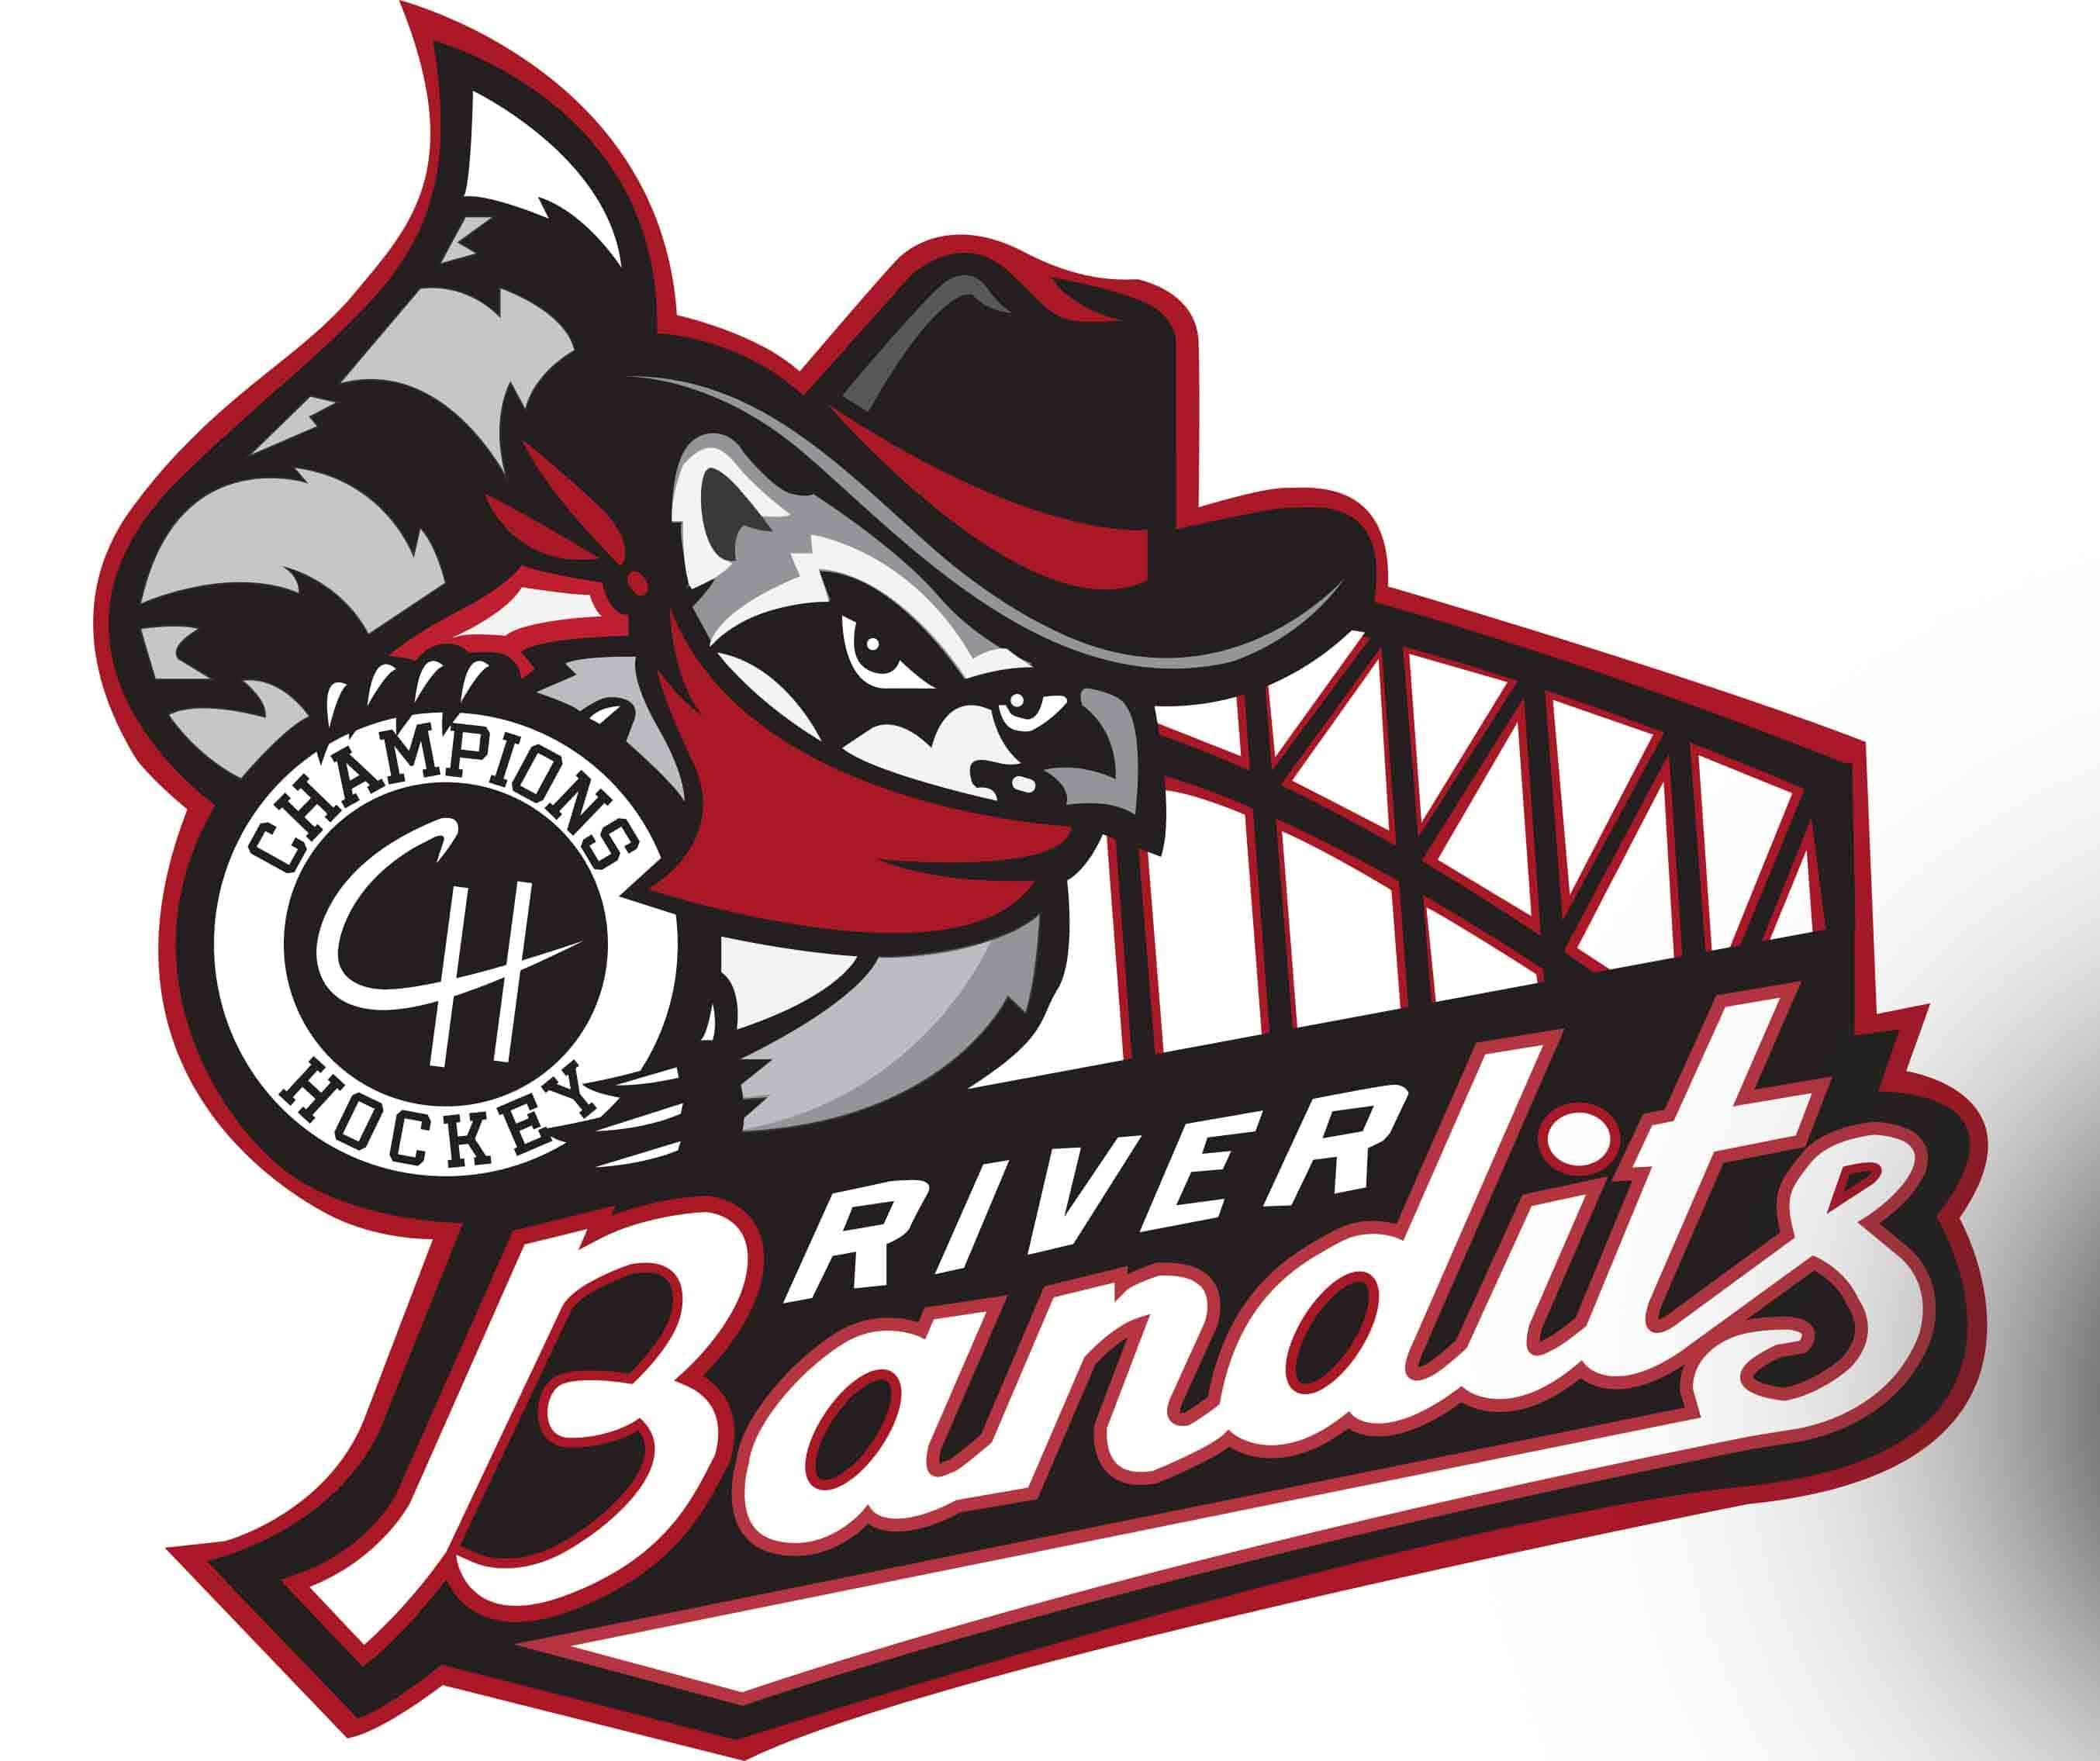 Champions River Bandits